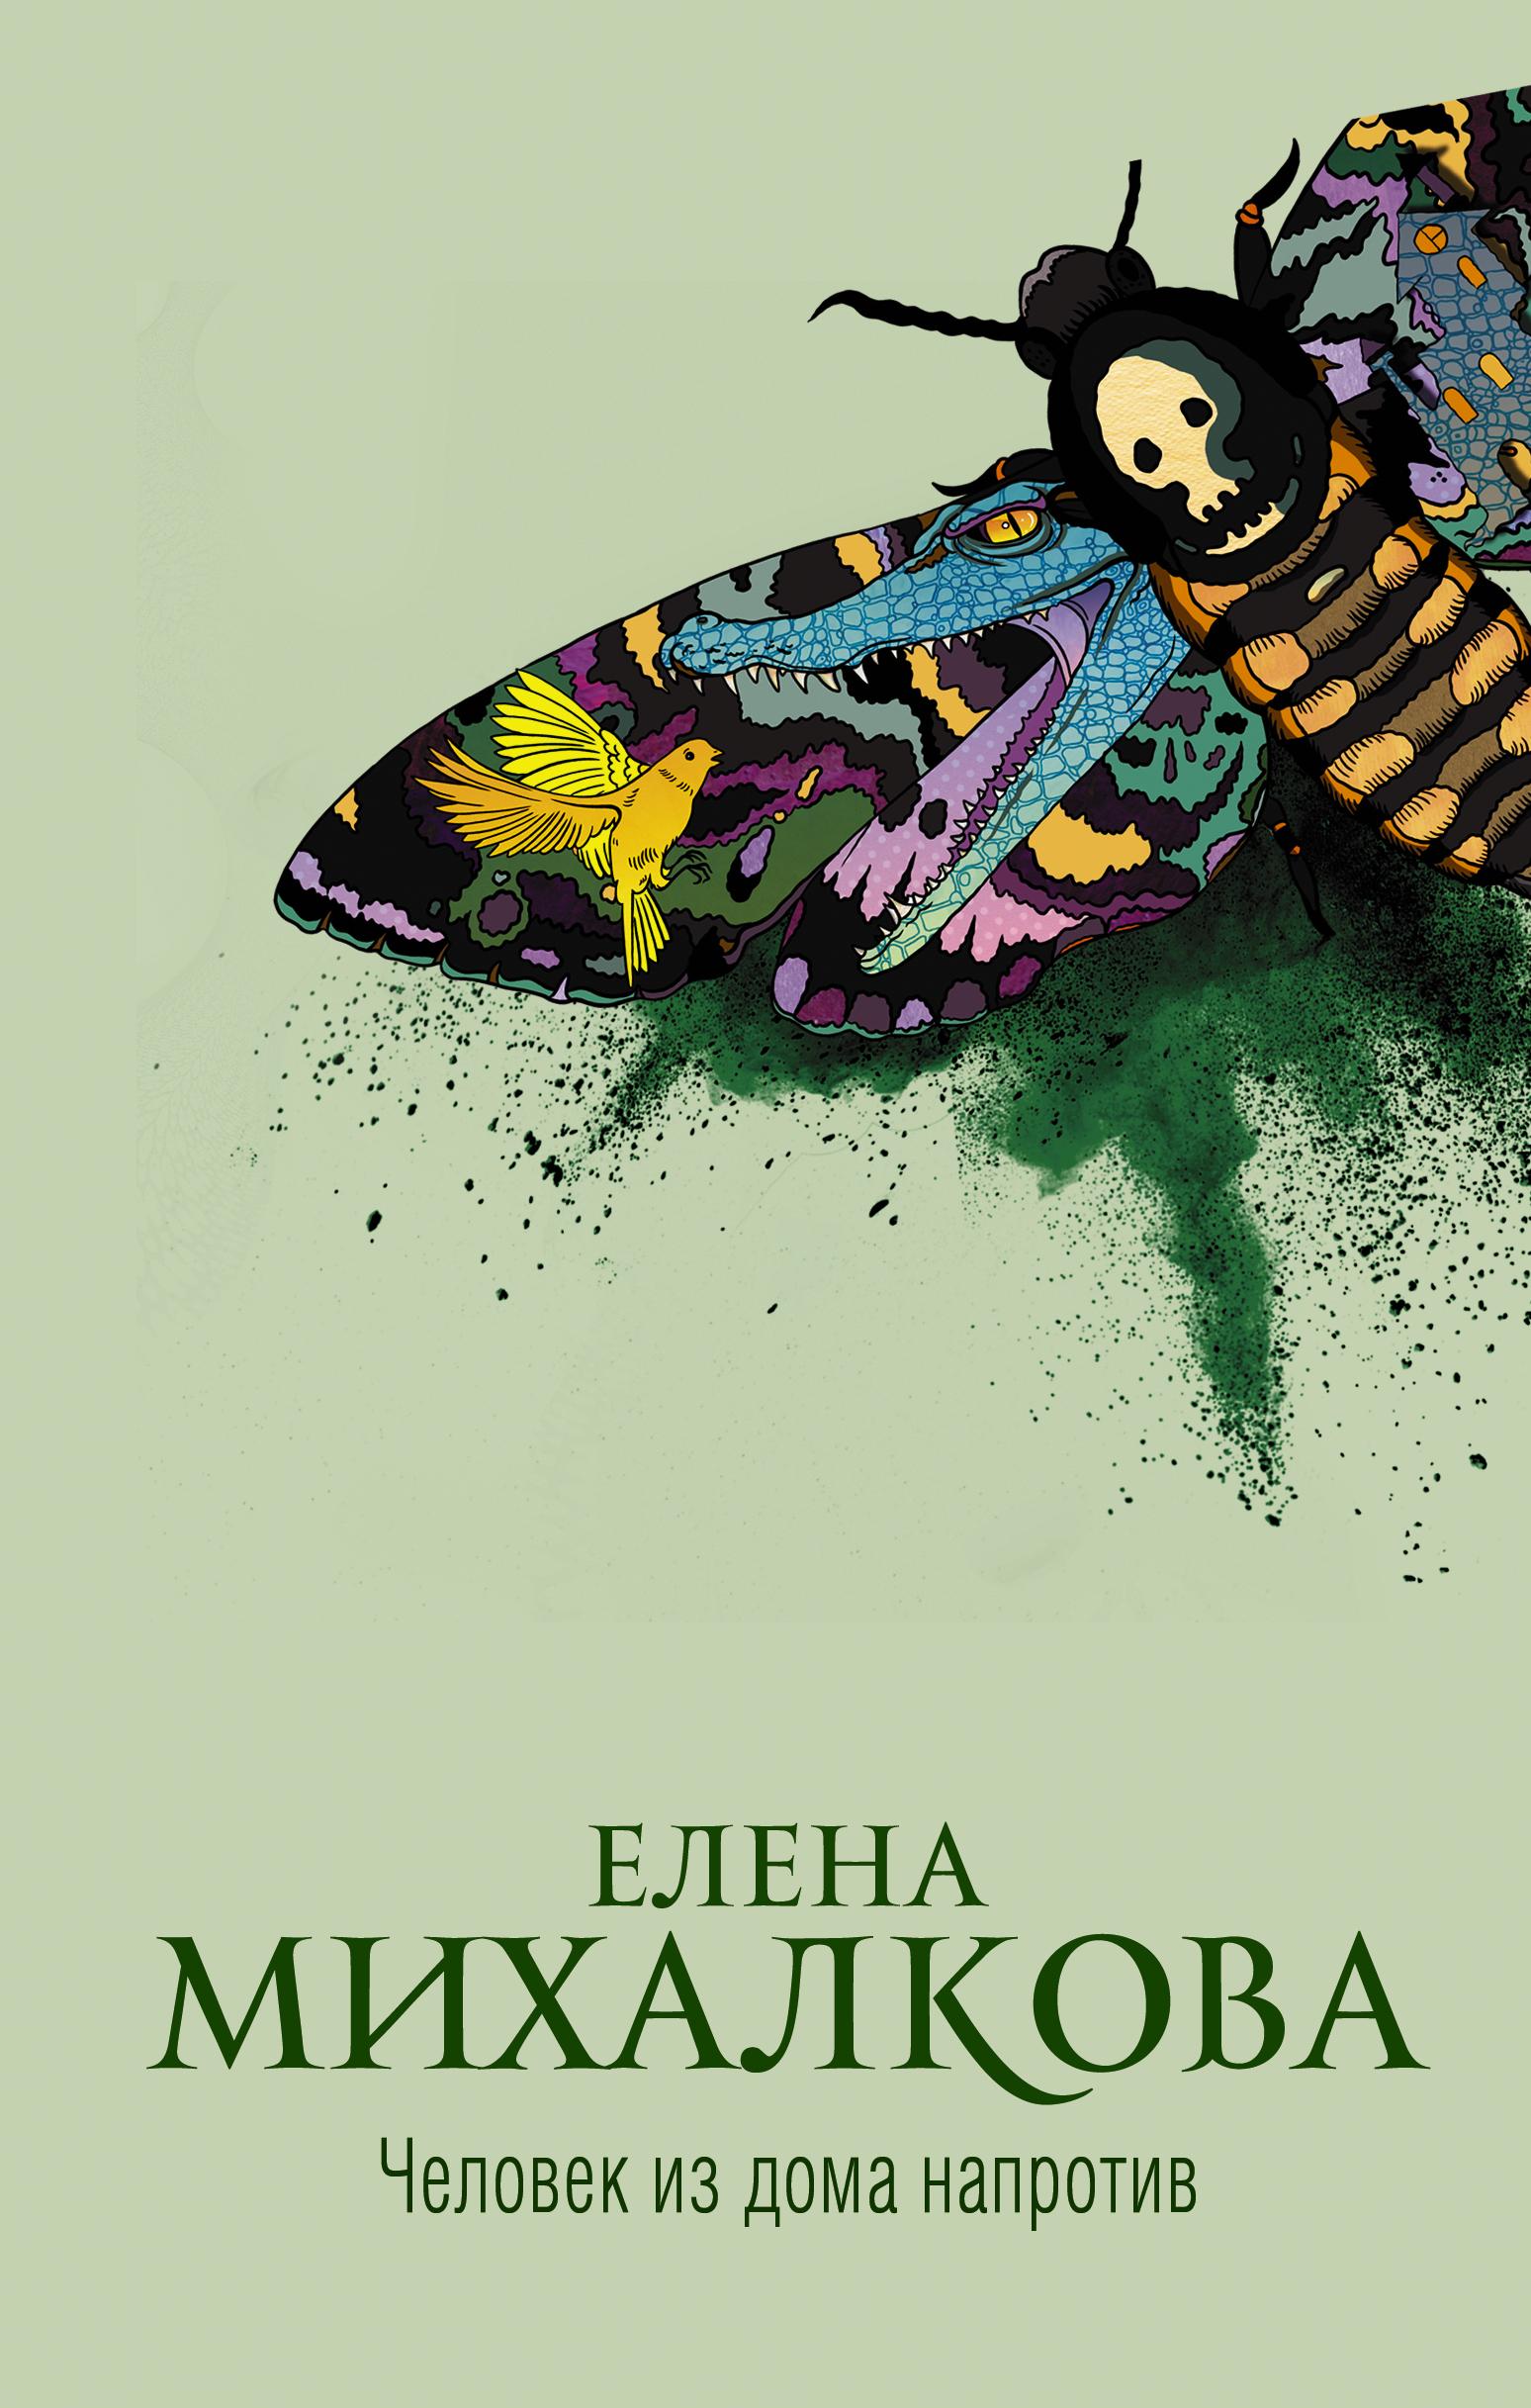 Елена Михалкова - Человек из дома напротив